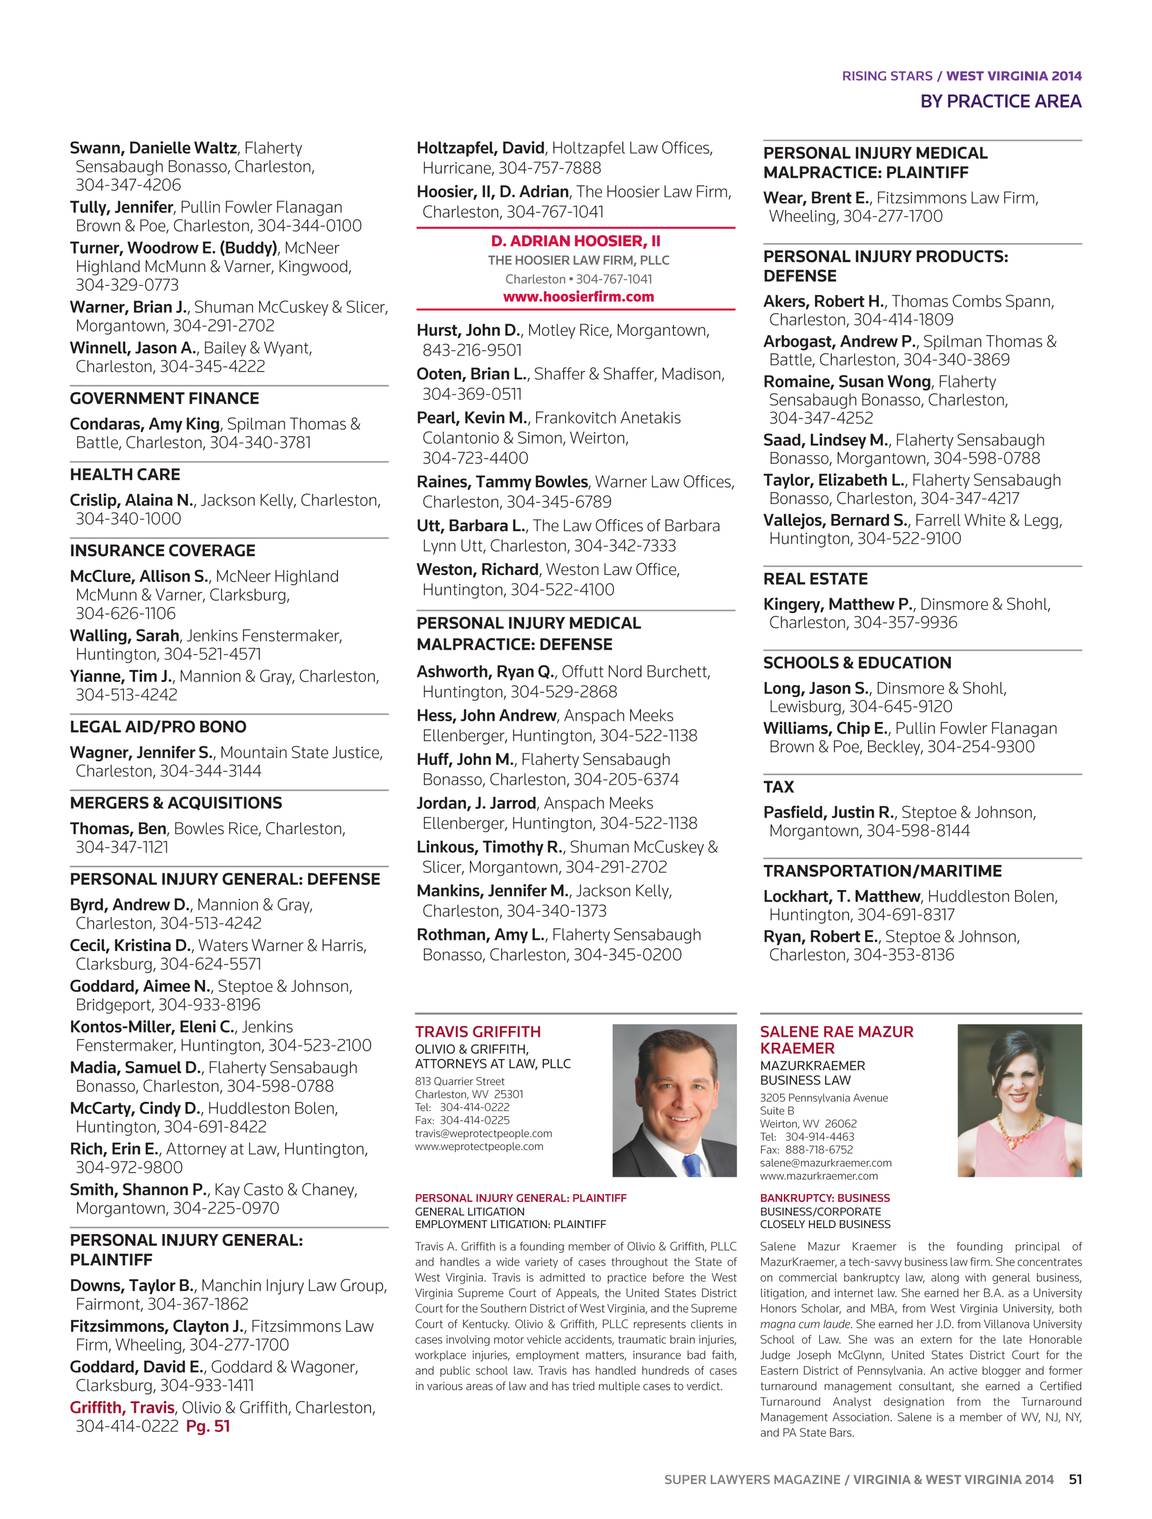 Super Lawyers - Oregon 2012 - page 50